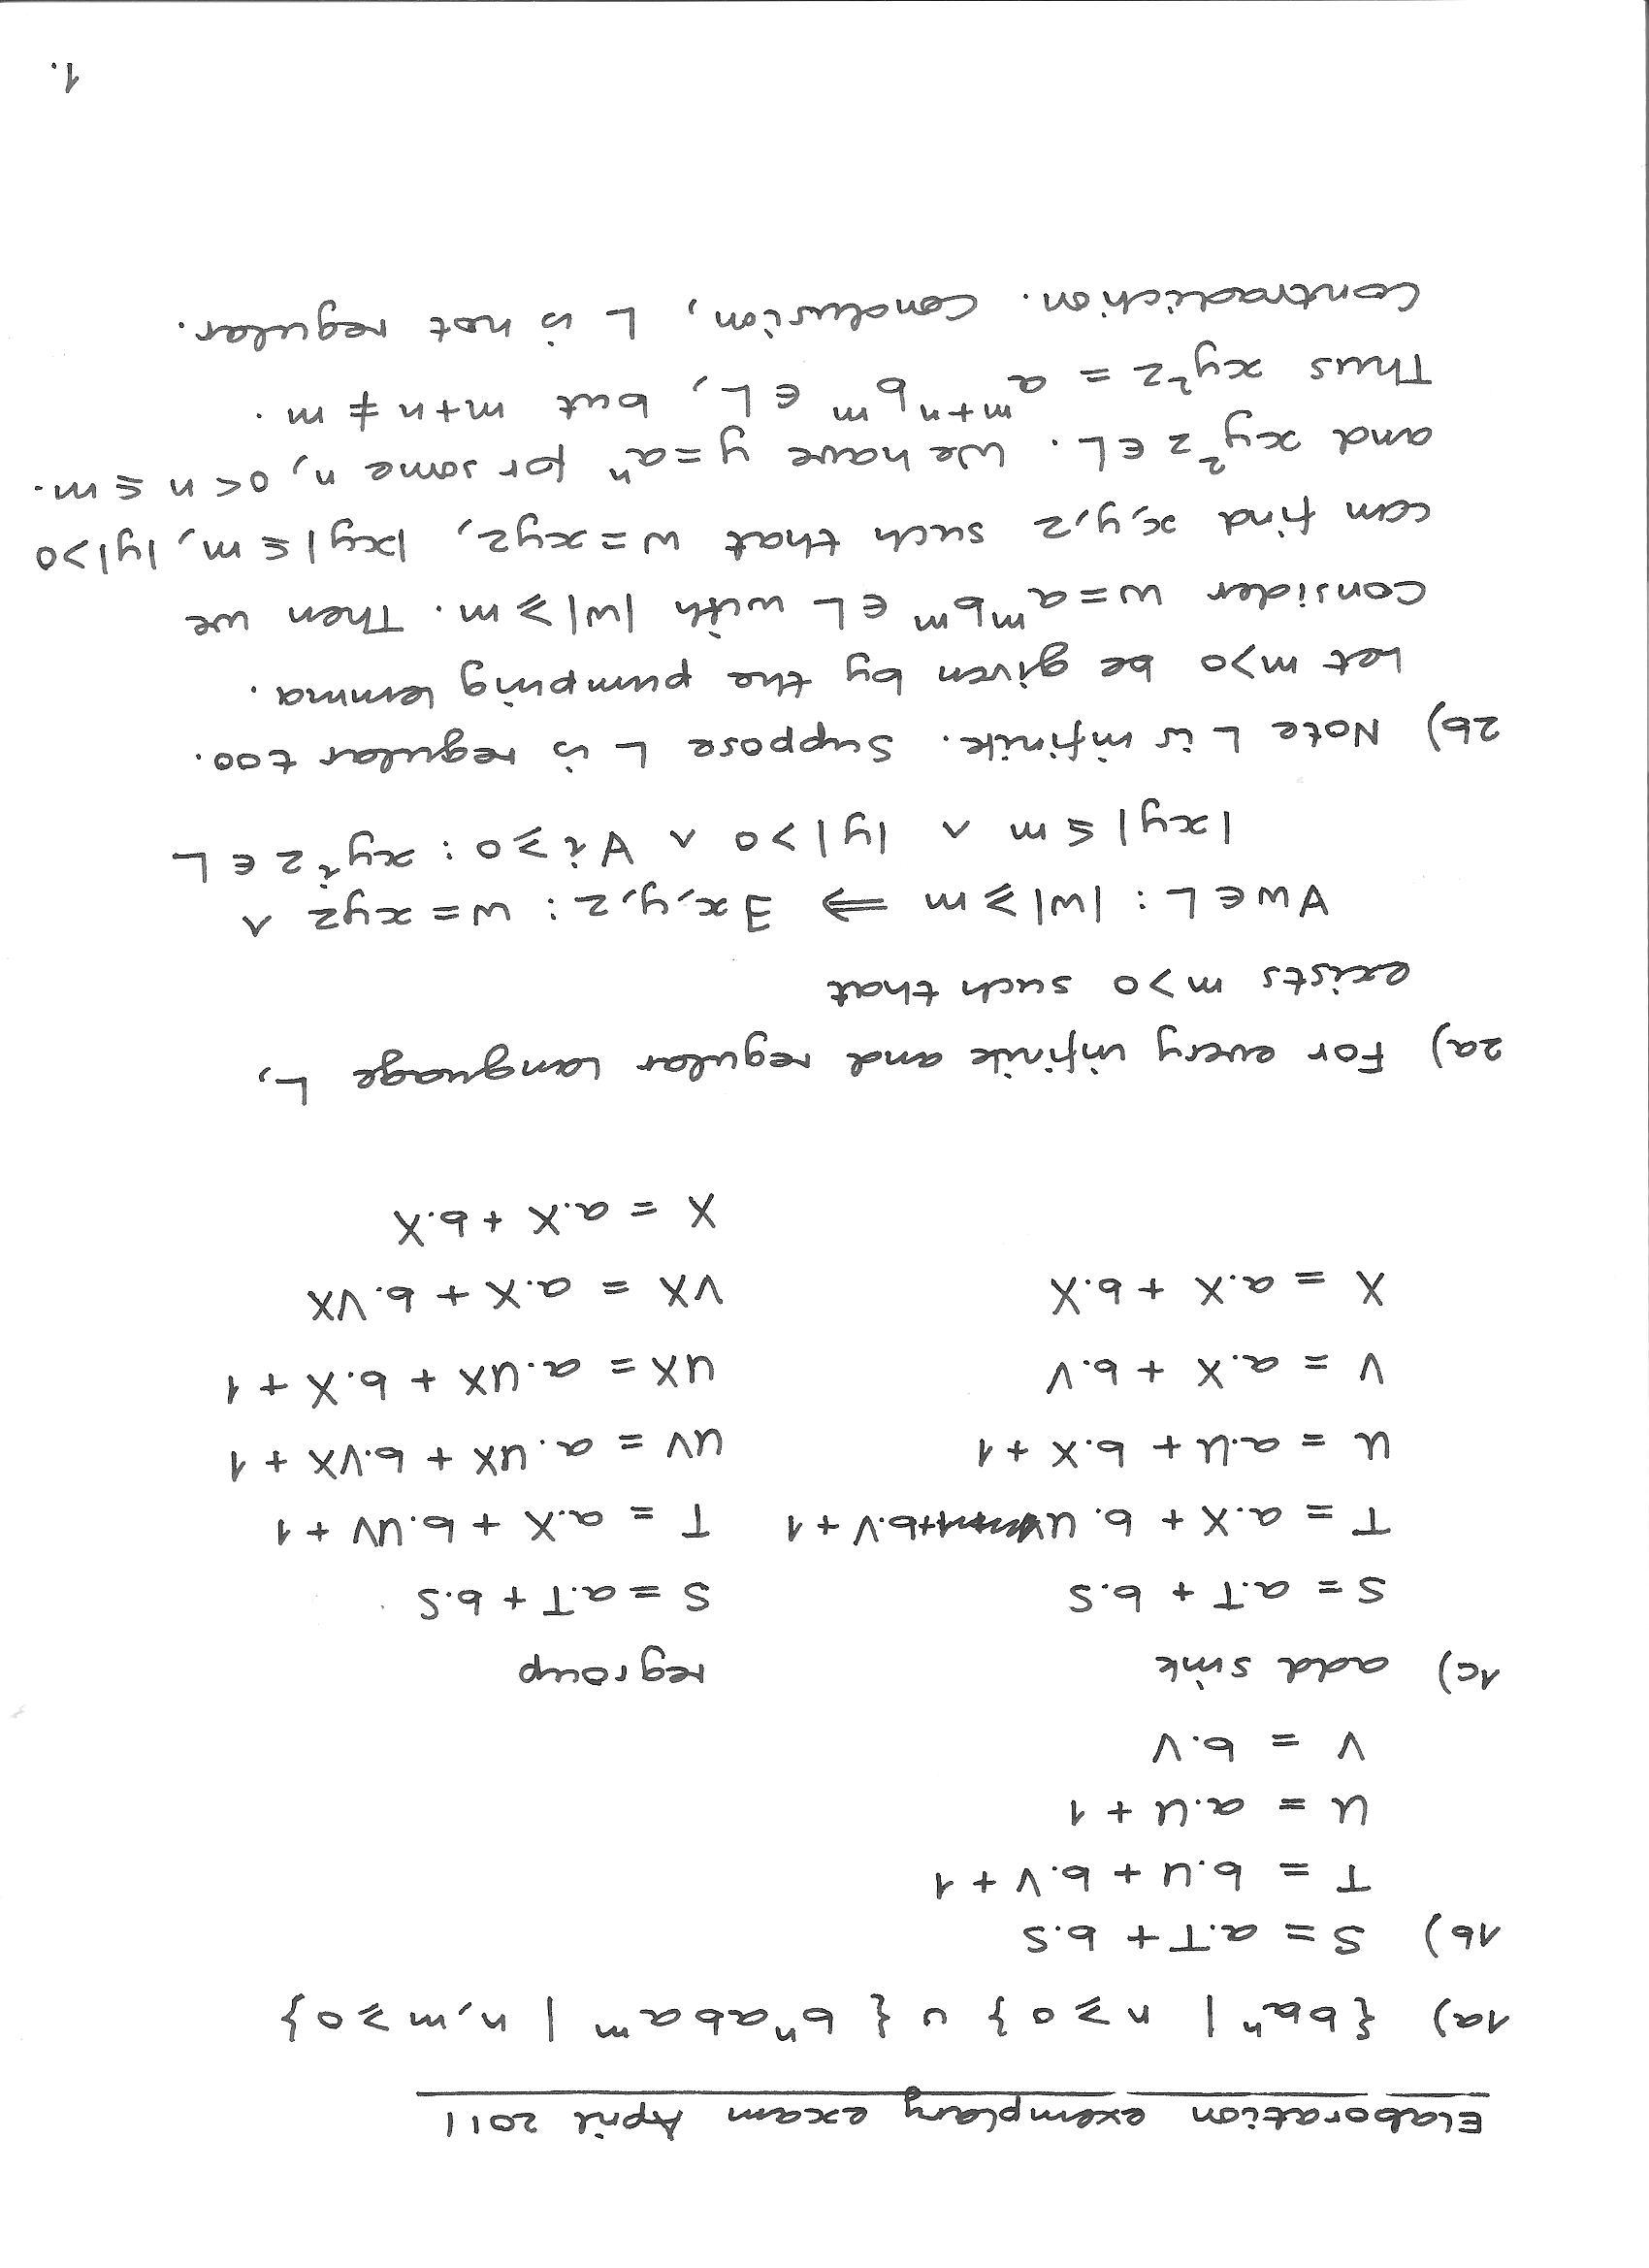 exam imm 2011 resit Studying ebp661c05 international marketing for ib at rijksuniversiteit groningen  exam april 2011  summary resit chapters 4, 6-8, 19,.